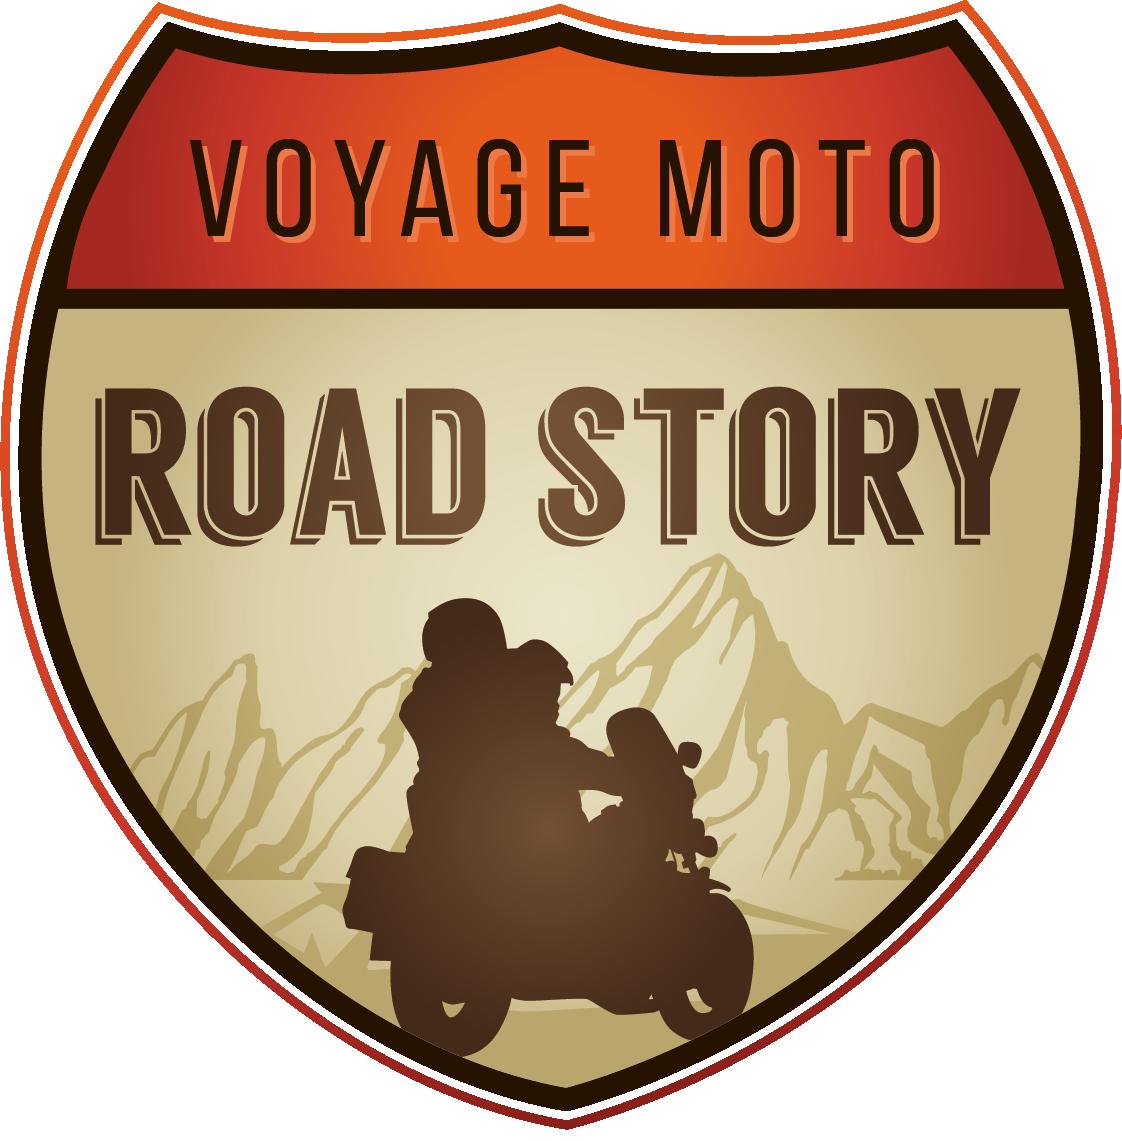 Roadstory logo 2017 transparent bd